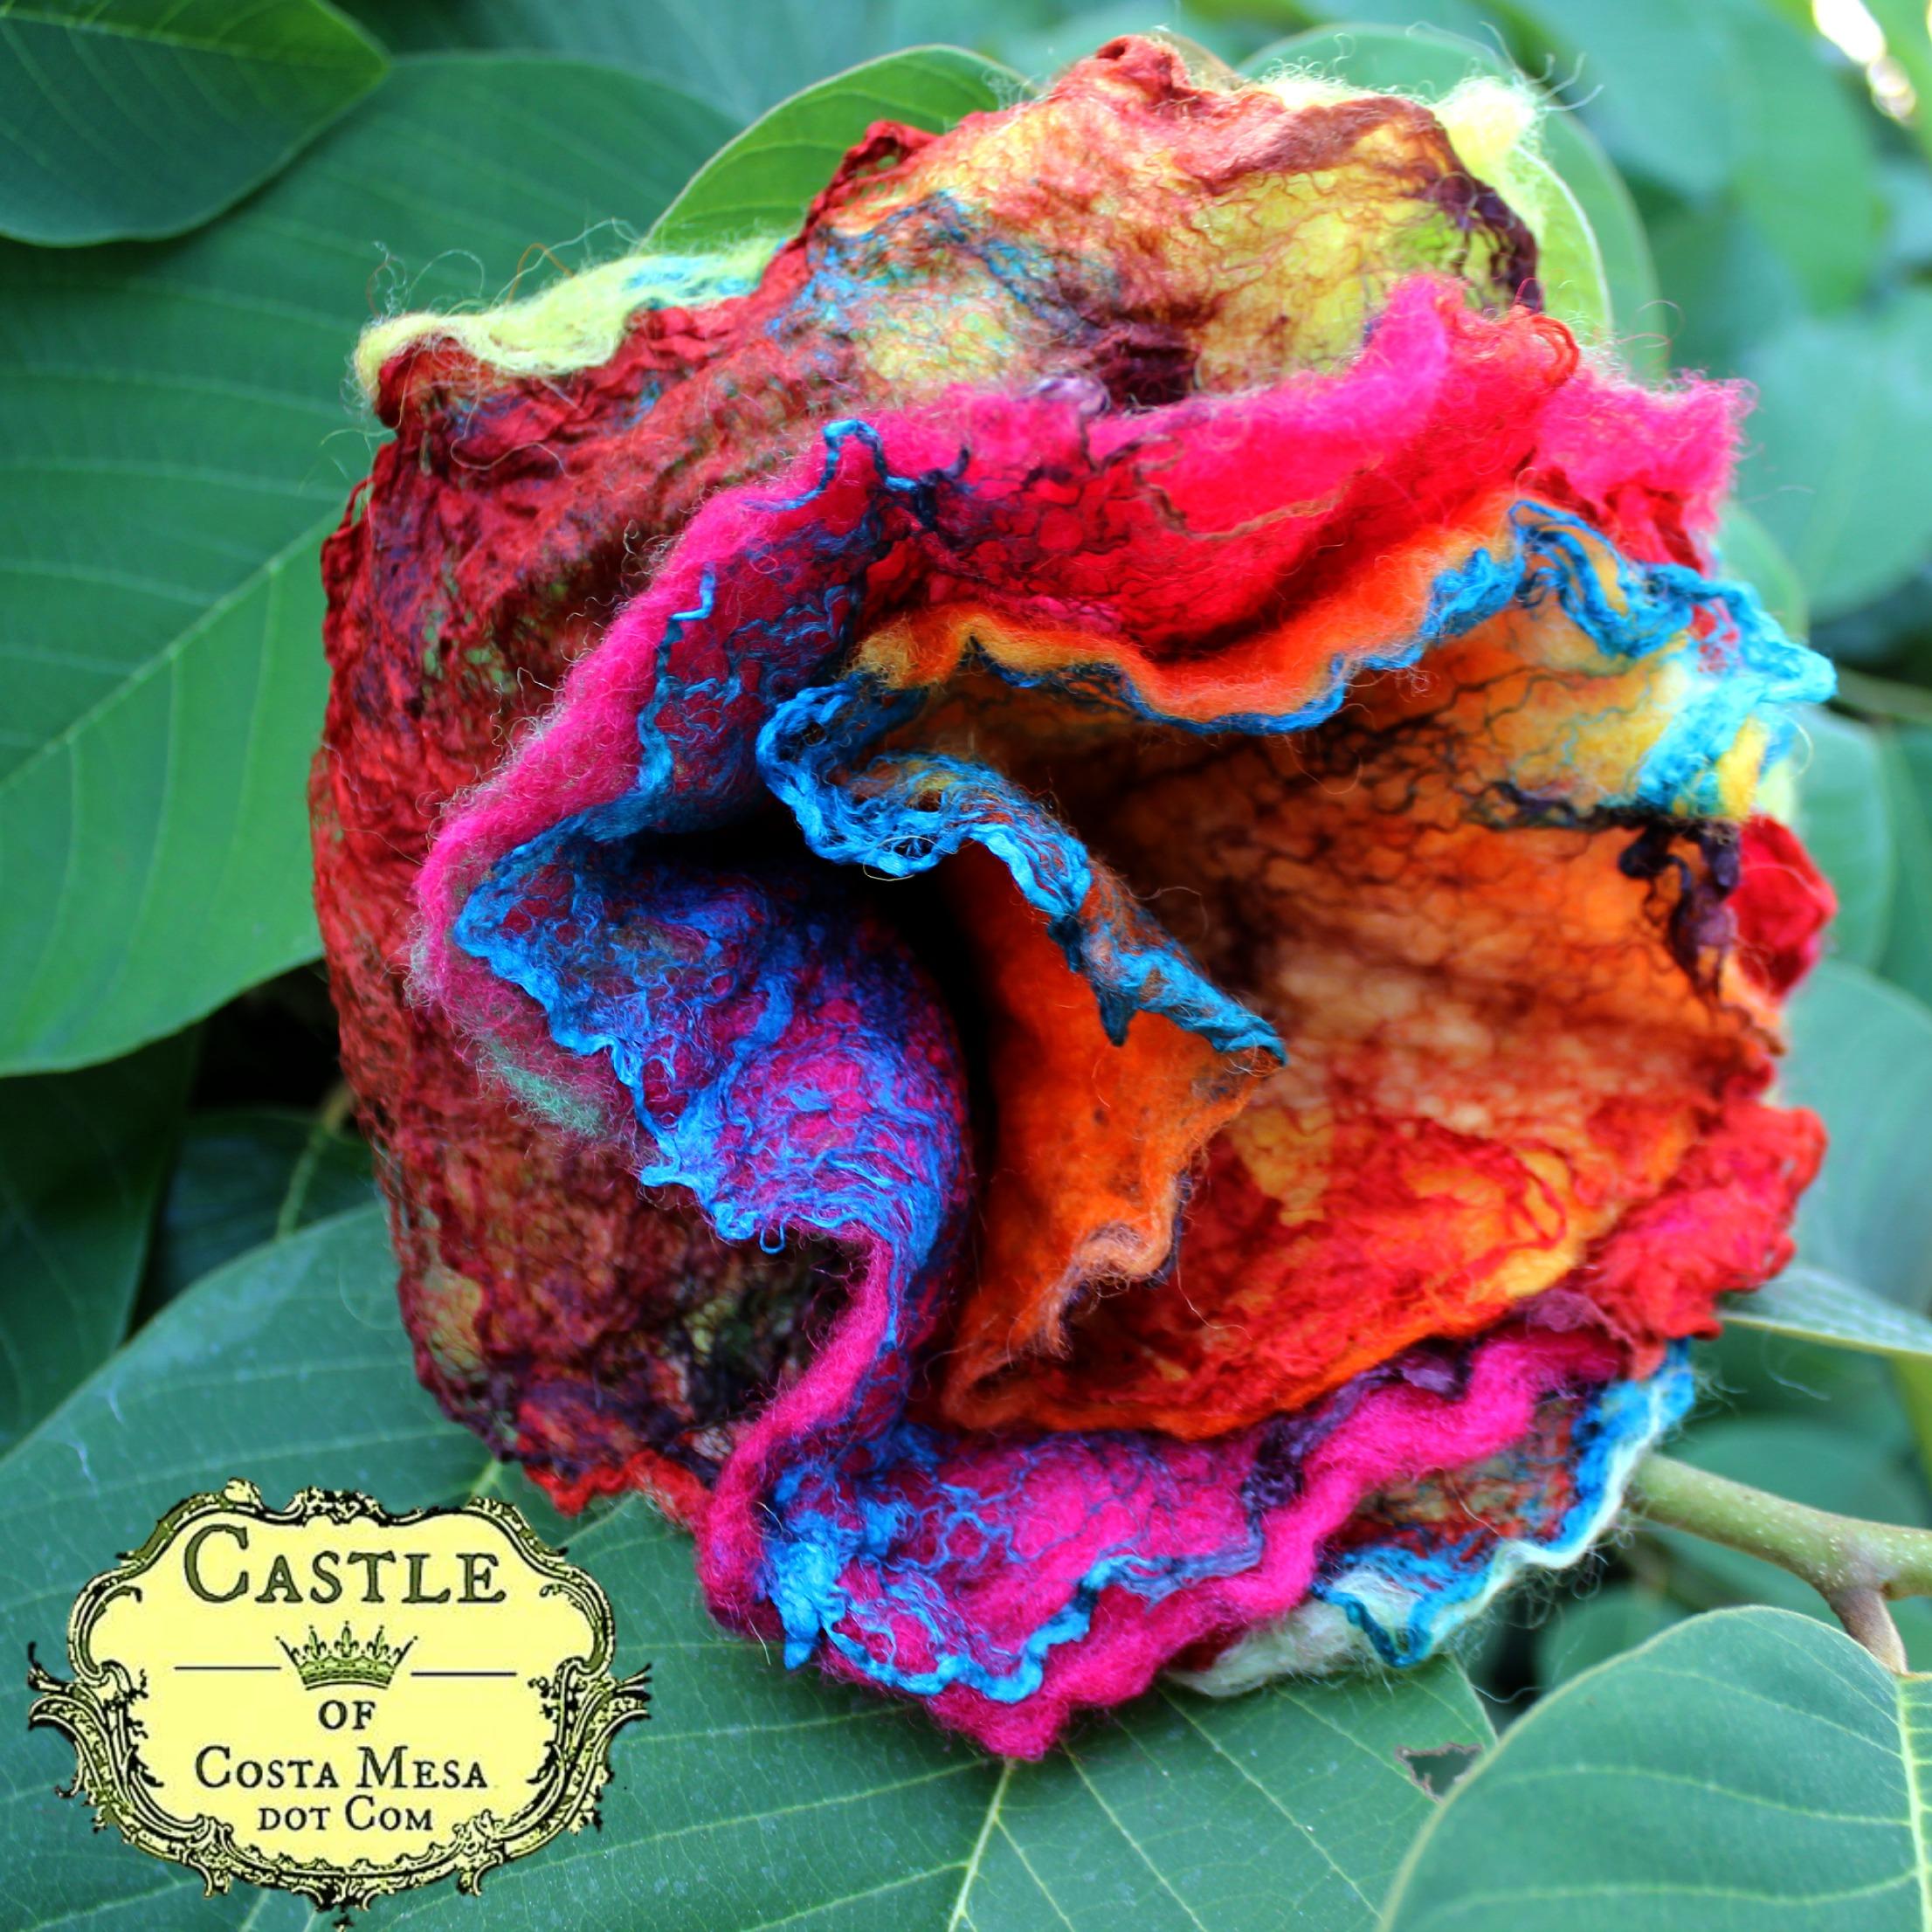 130918 Single flower. Jzin's first wet-felted flowers using mawata silk hankies